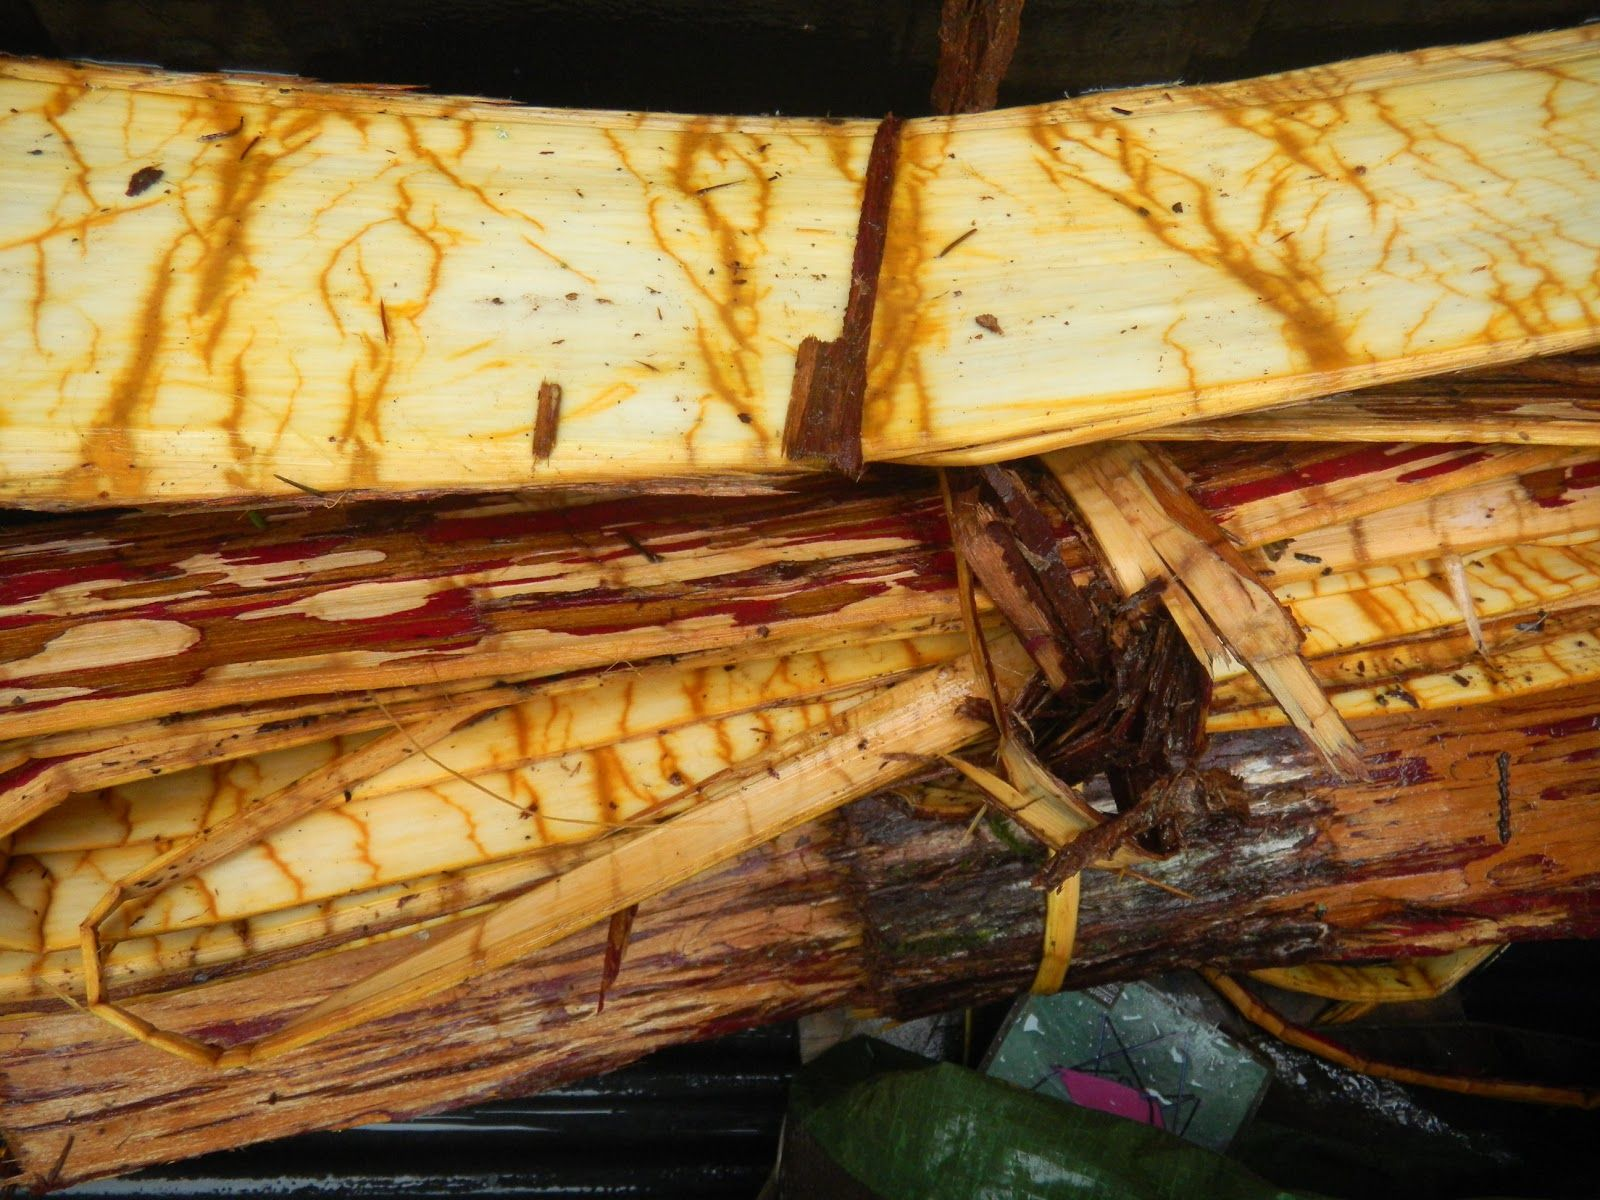 254 best roots images on pinterest native americans native art giihlgiigaa haida weaver how to harvest cedar bark harvestweavingrootspreschoolbasketskid fandeluxe Ebook collections